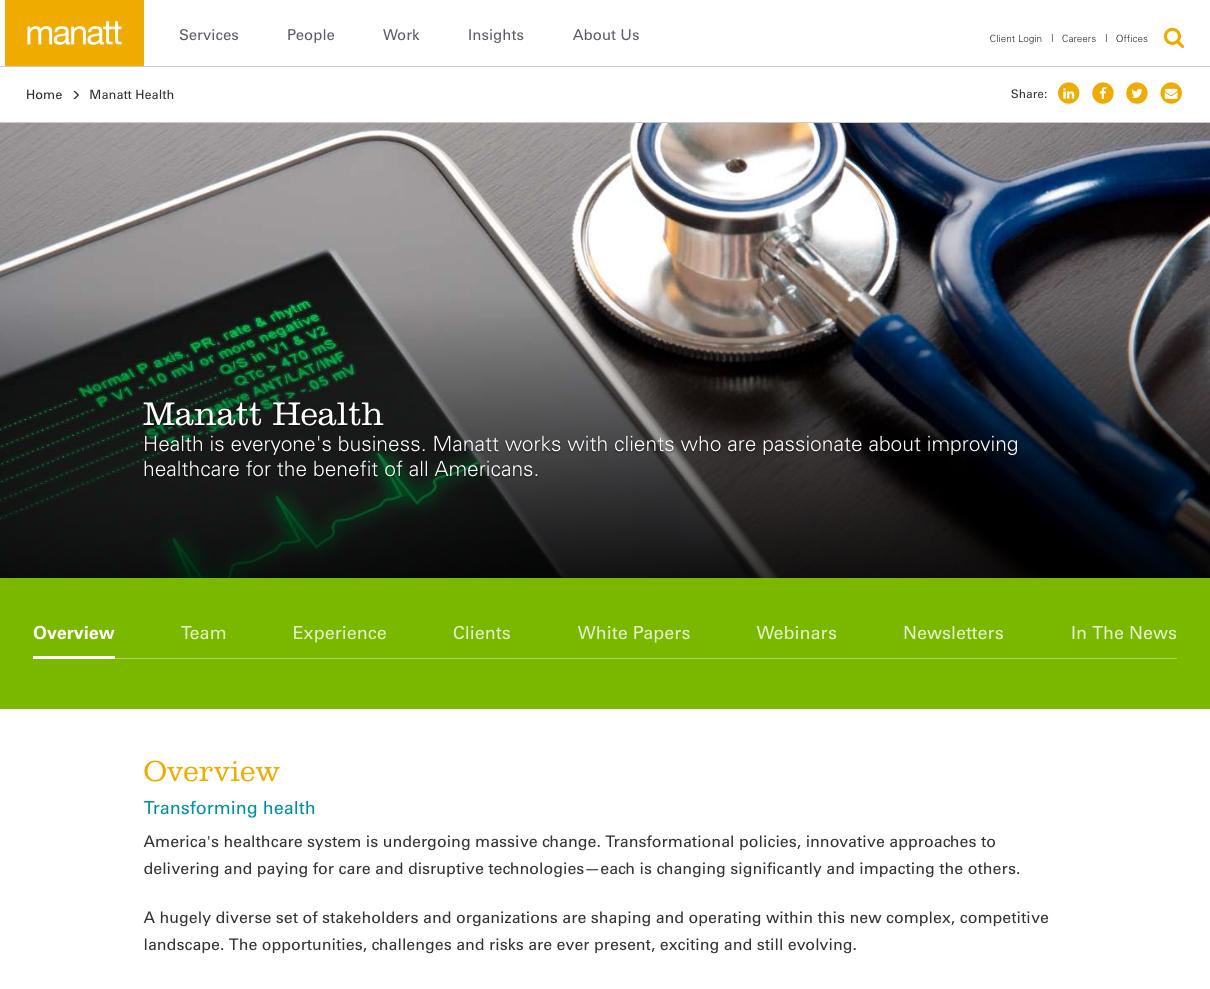 Mannatt Health page